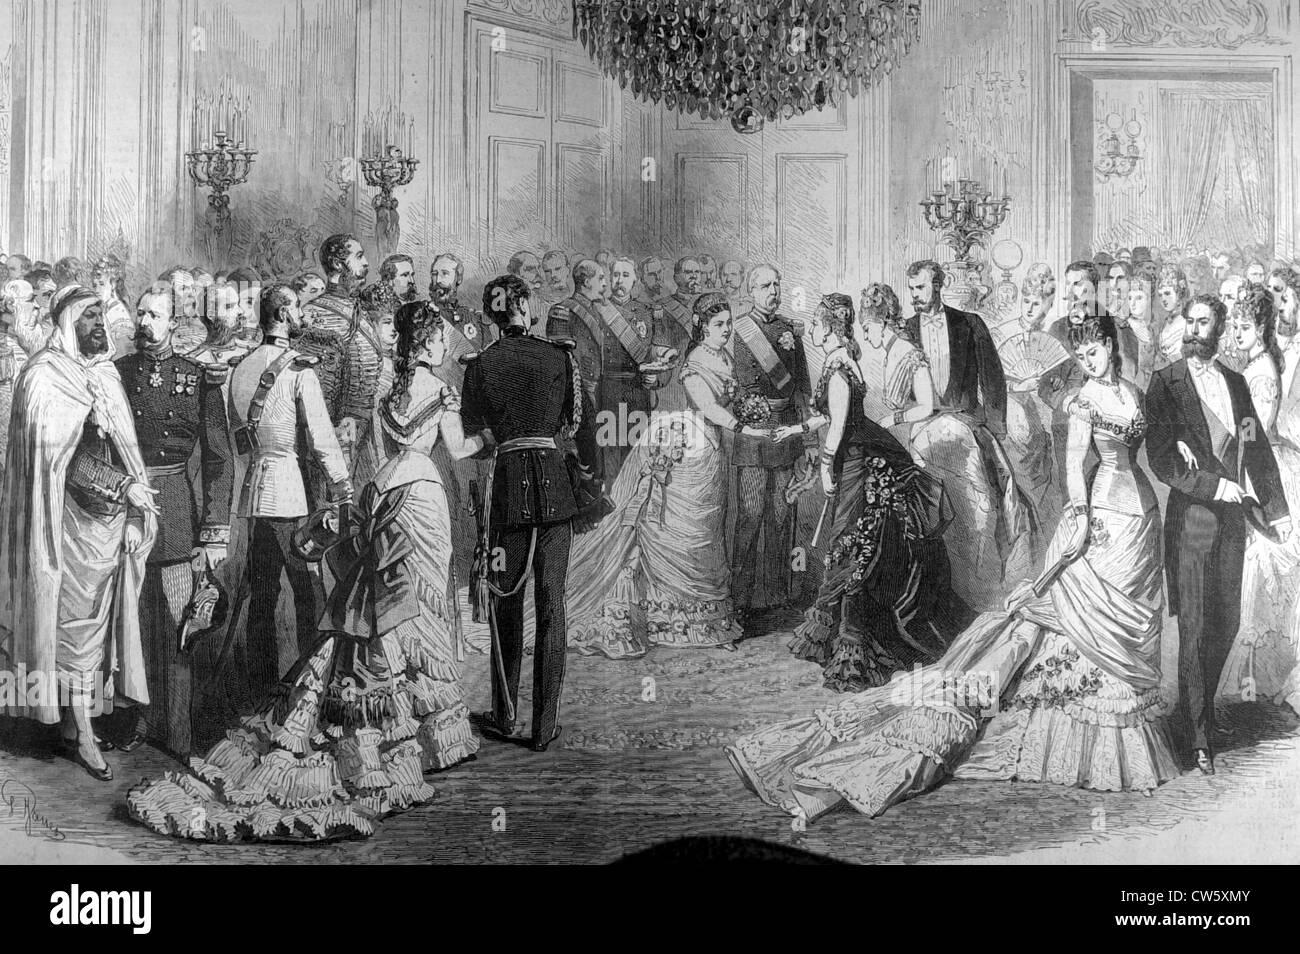 A ball at the Elysée Palace in Paris - Stock Image